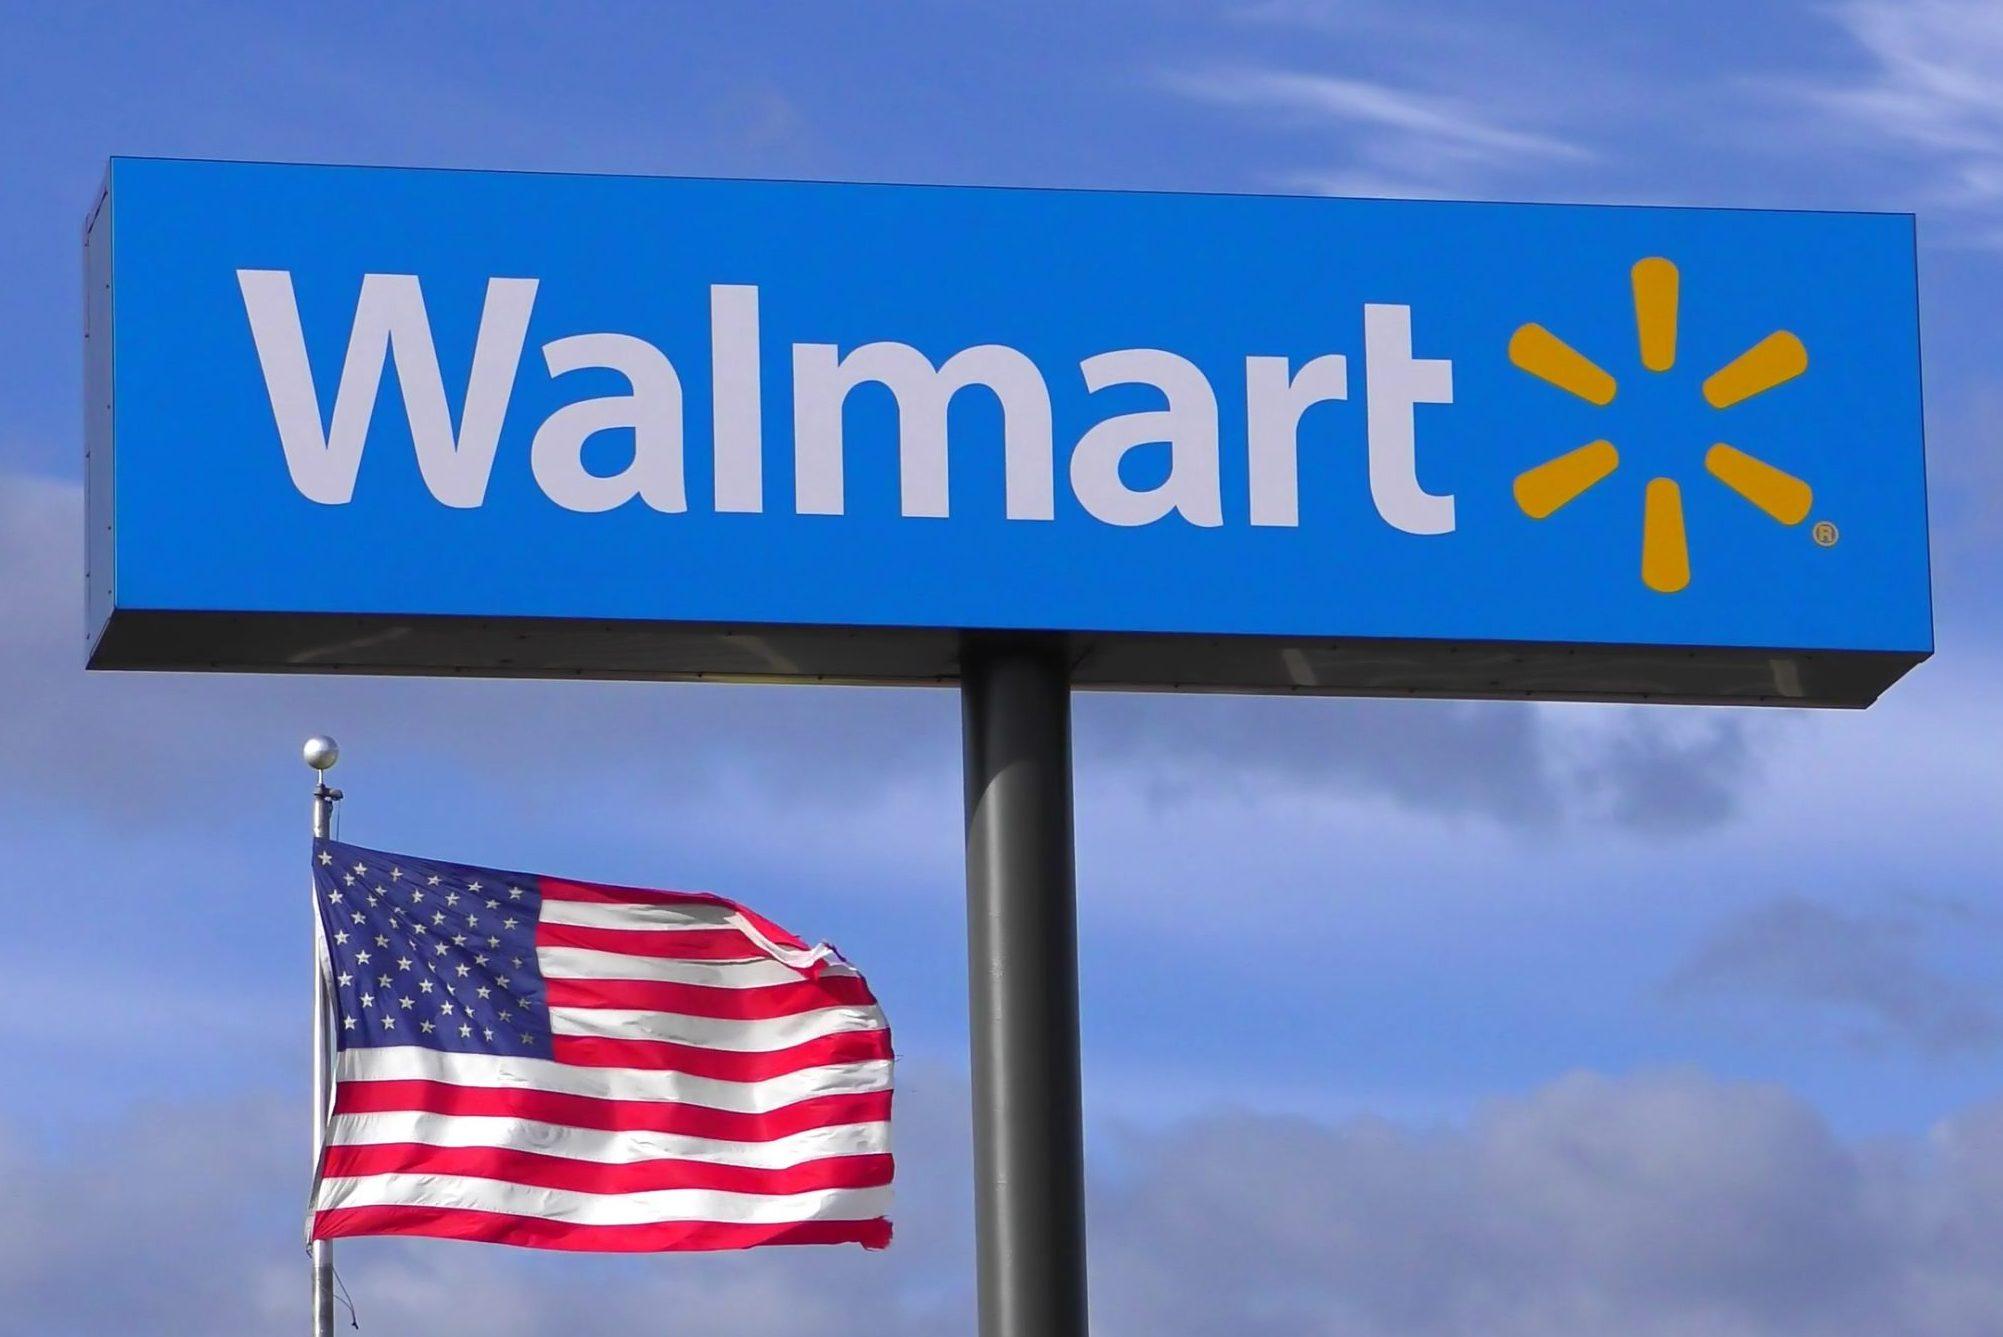 Walmart - literair vertalen (shutterstock)